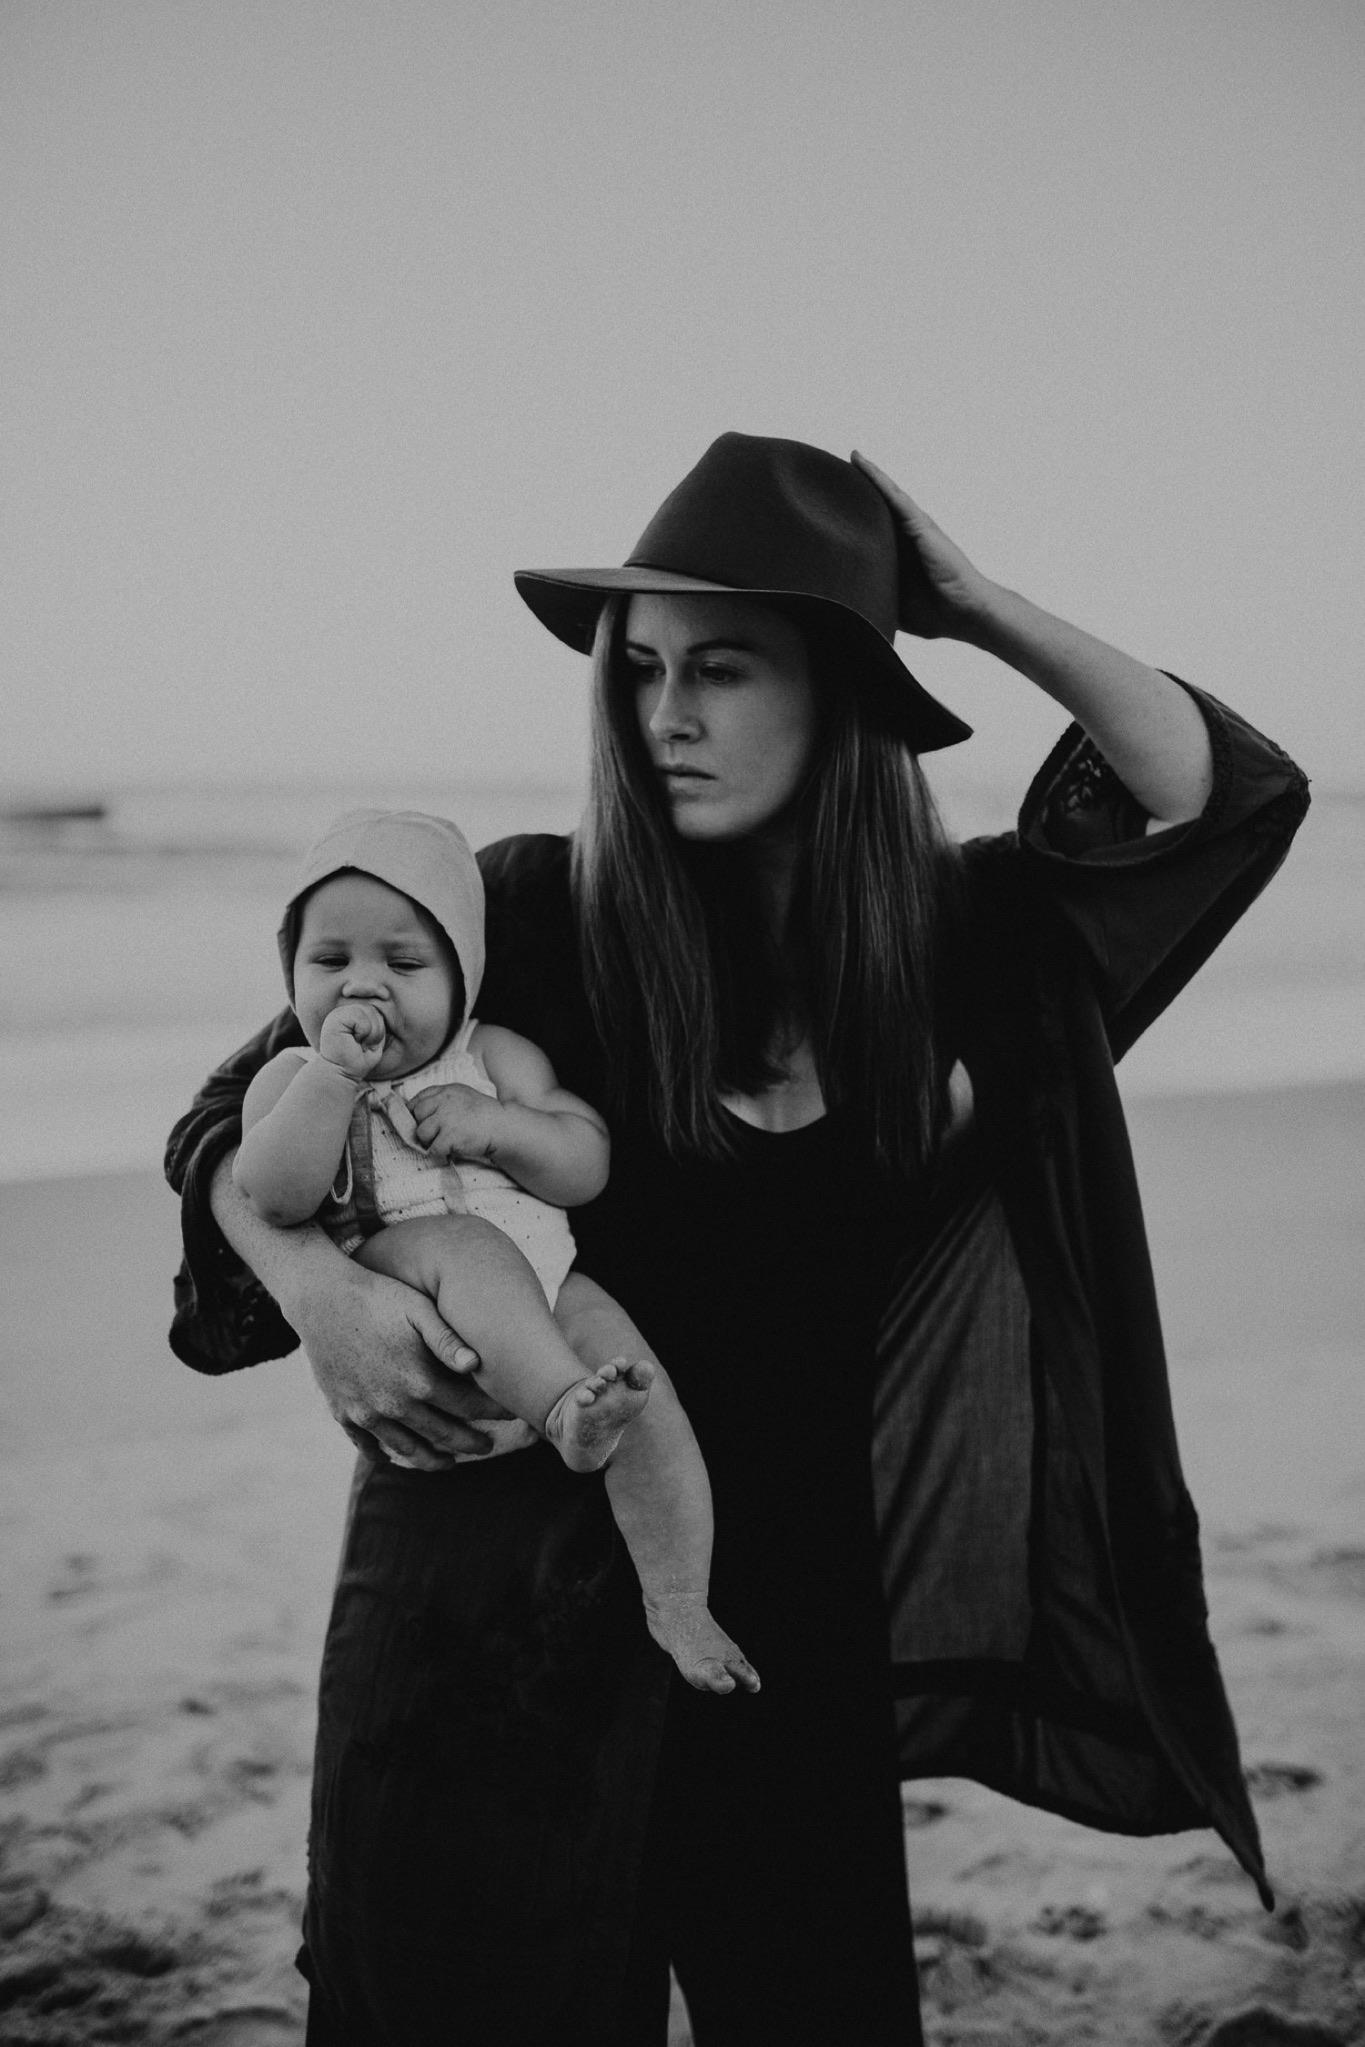 000000021_LOVEHERWILDPHOTOGRAPHY_128_Motherhood_goldcoastphotographer_motherhoodphotography_Loveherwildphotography_byronbayphotographer.jpg